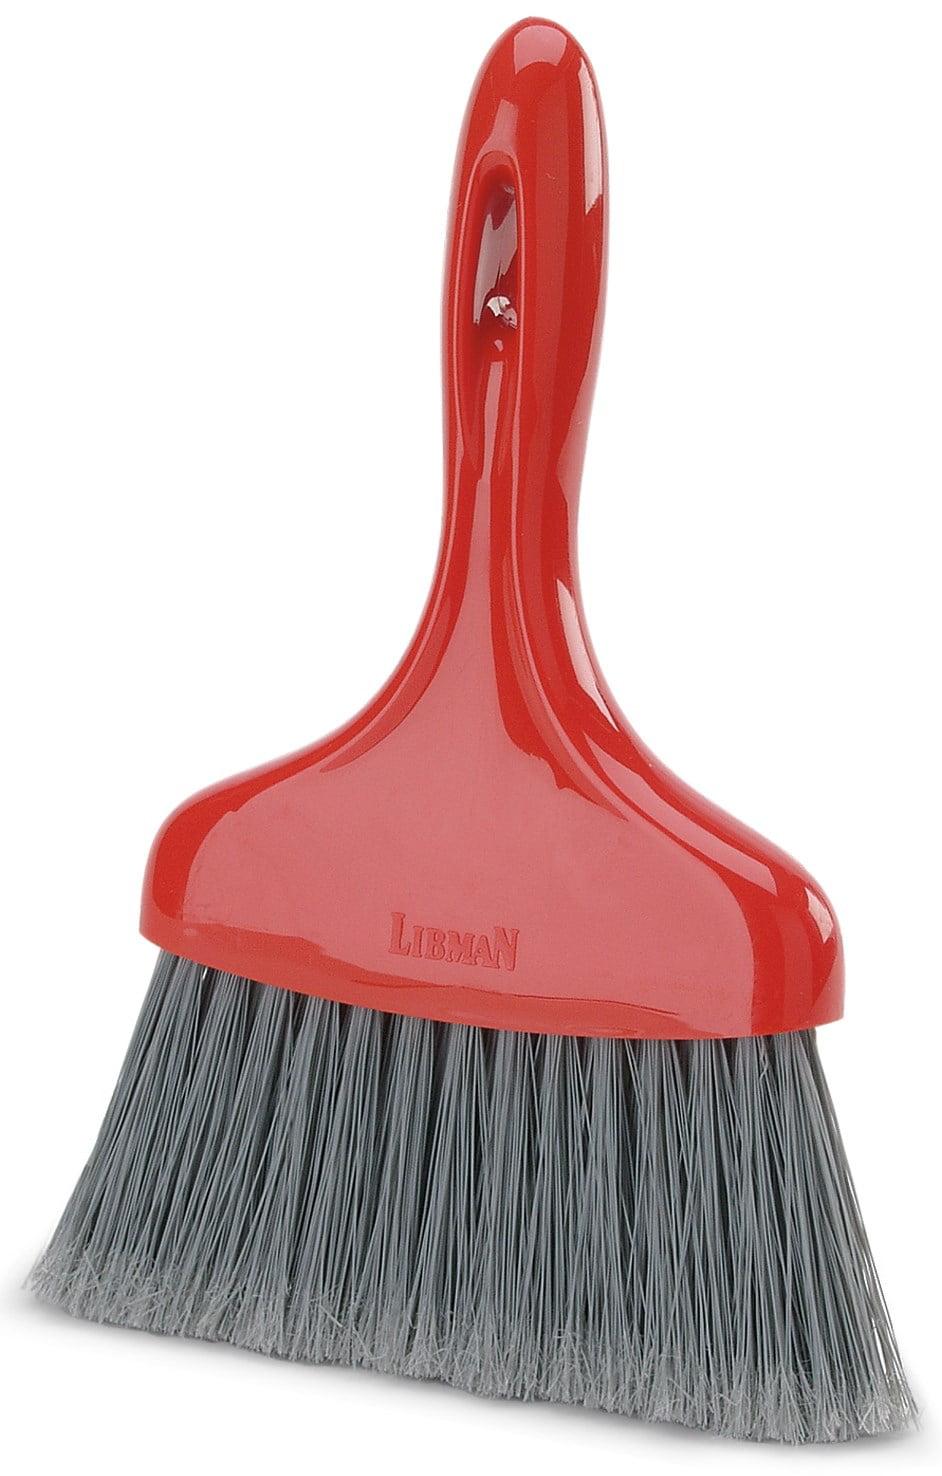 Libman 00907 Red & Black Whisk Broom – Walmart Inventory